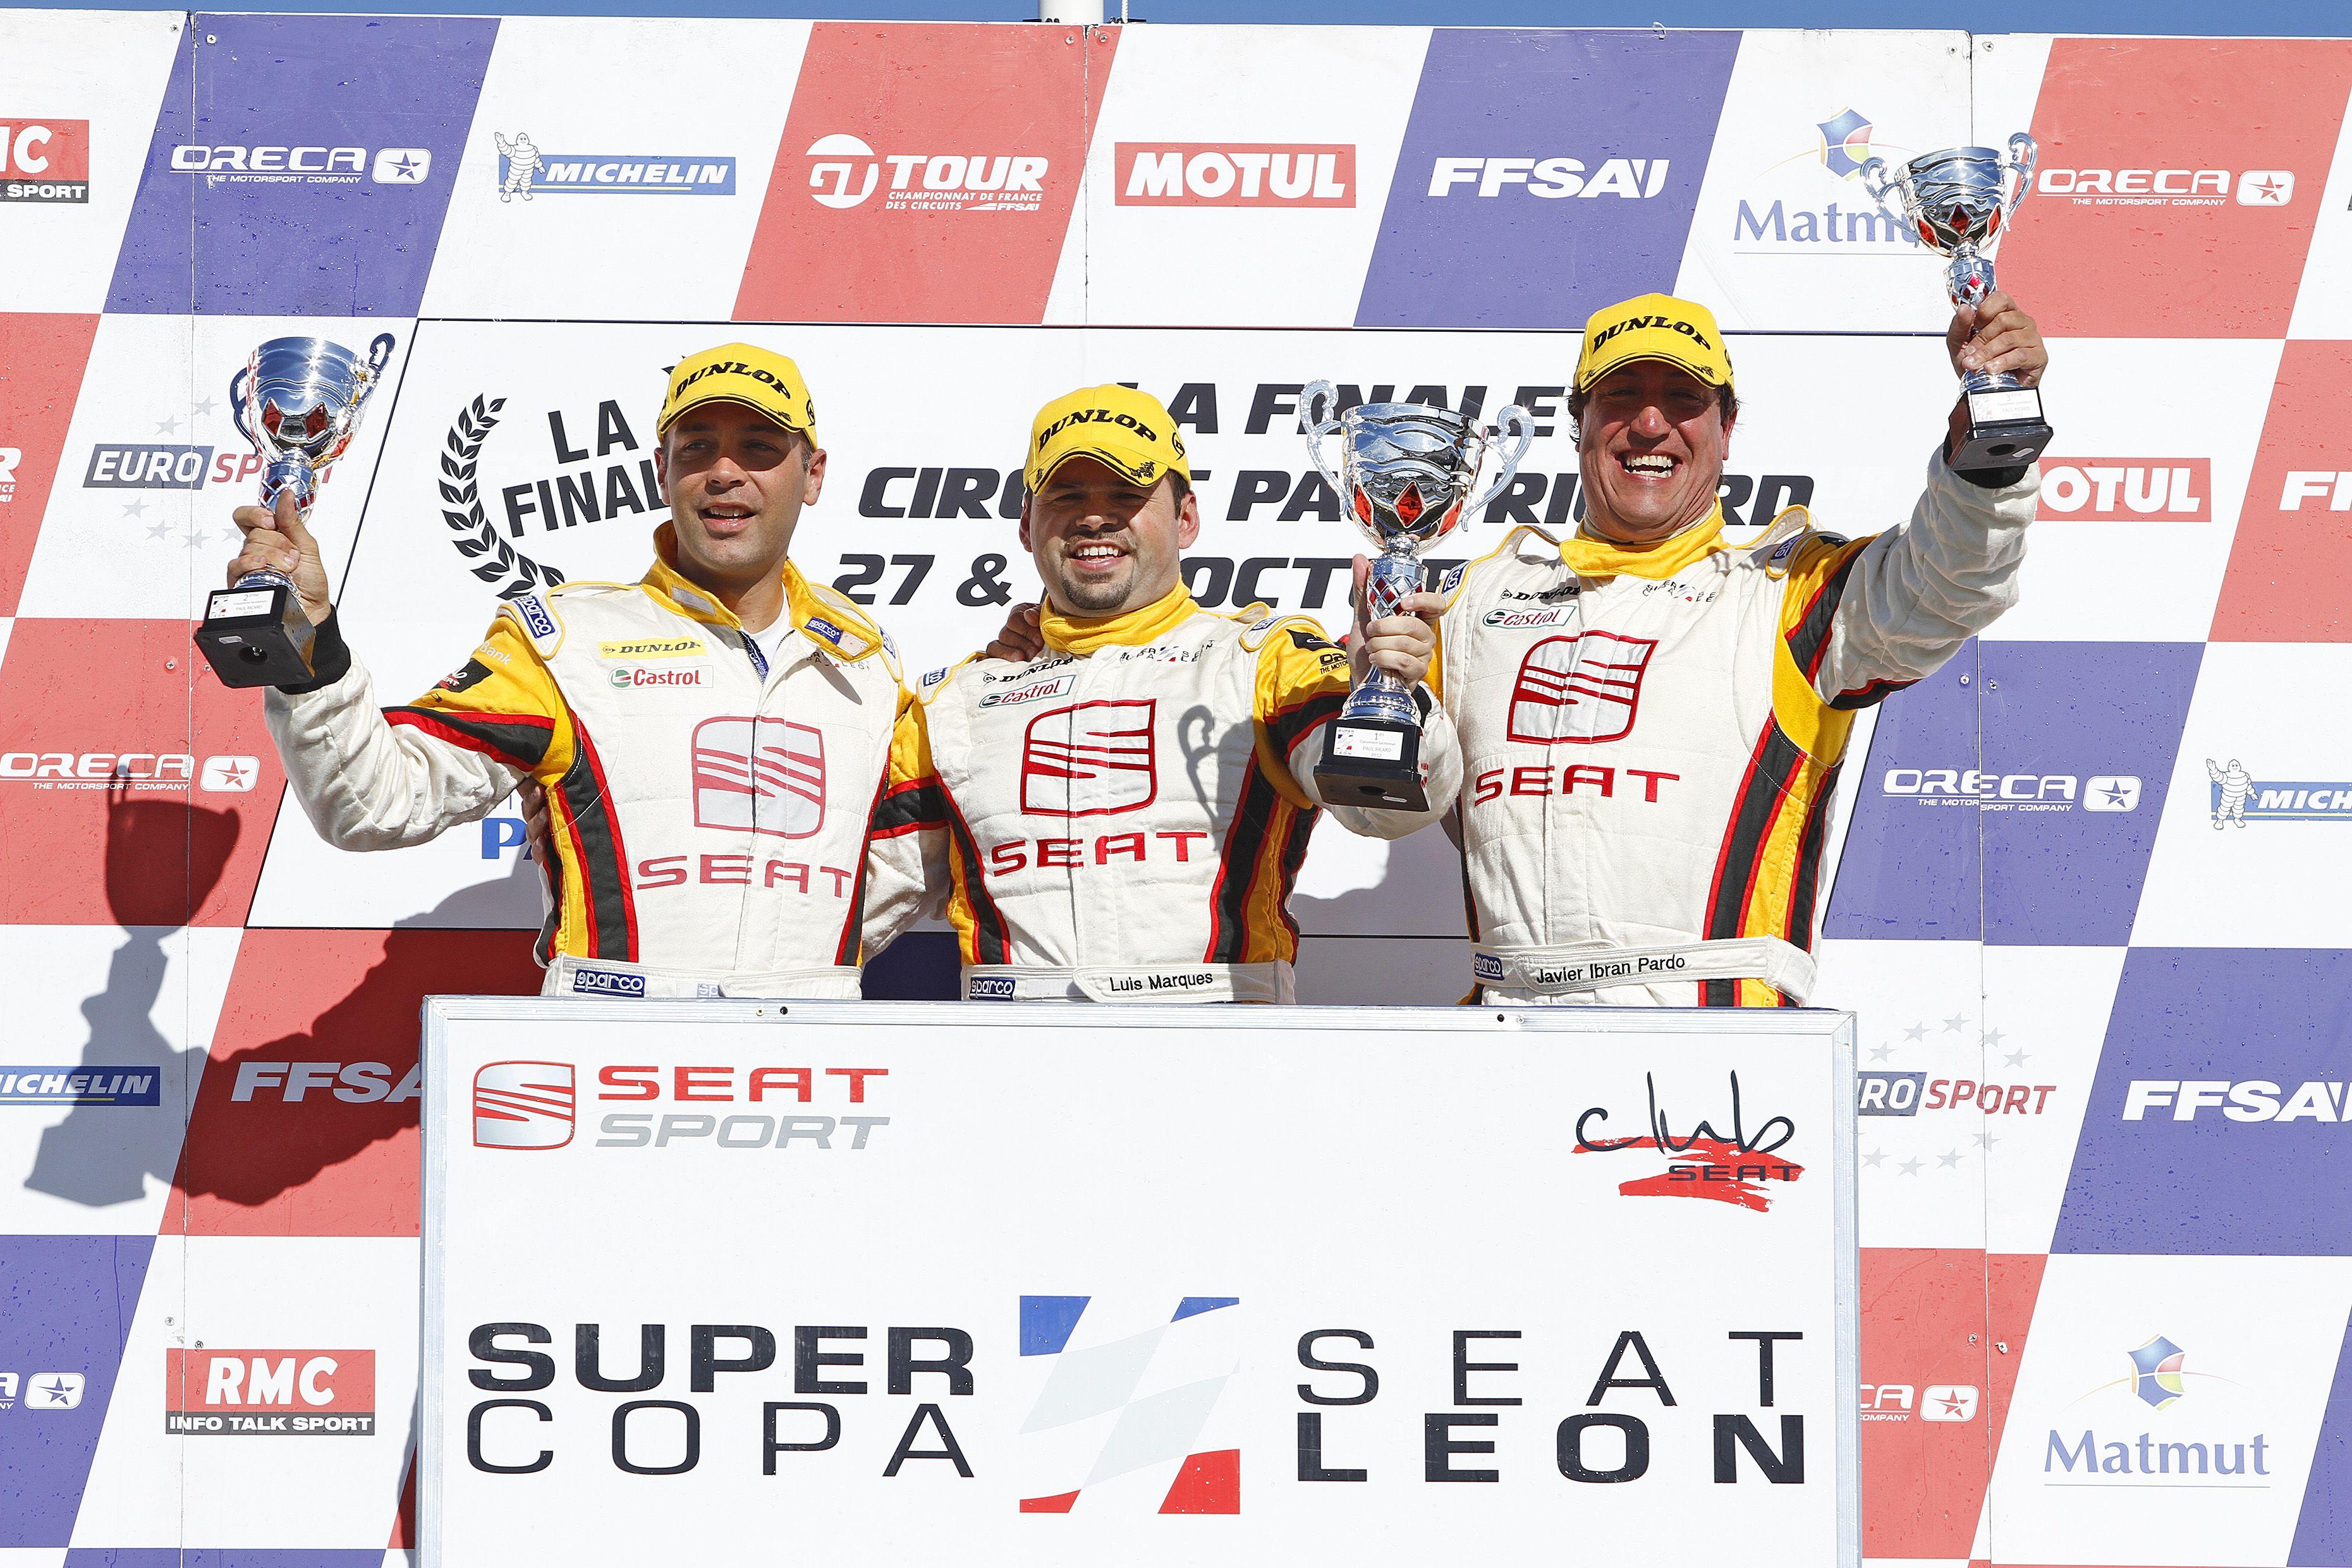 Supercopa SEAT León France